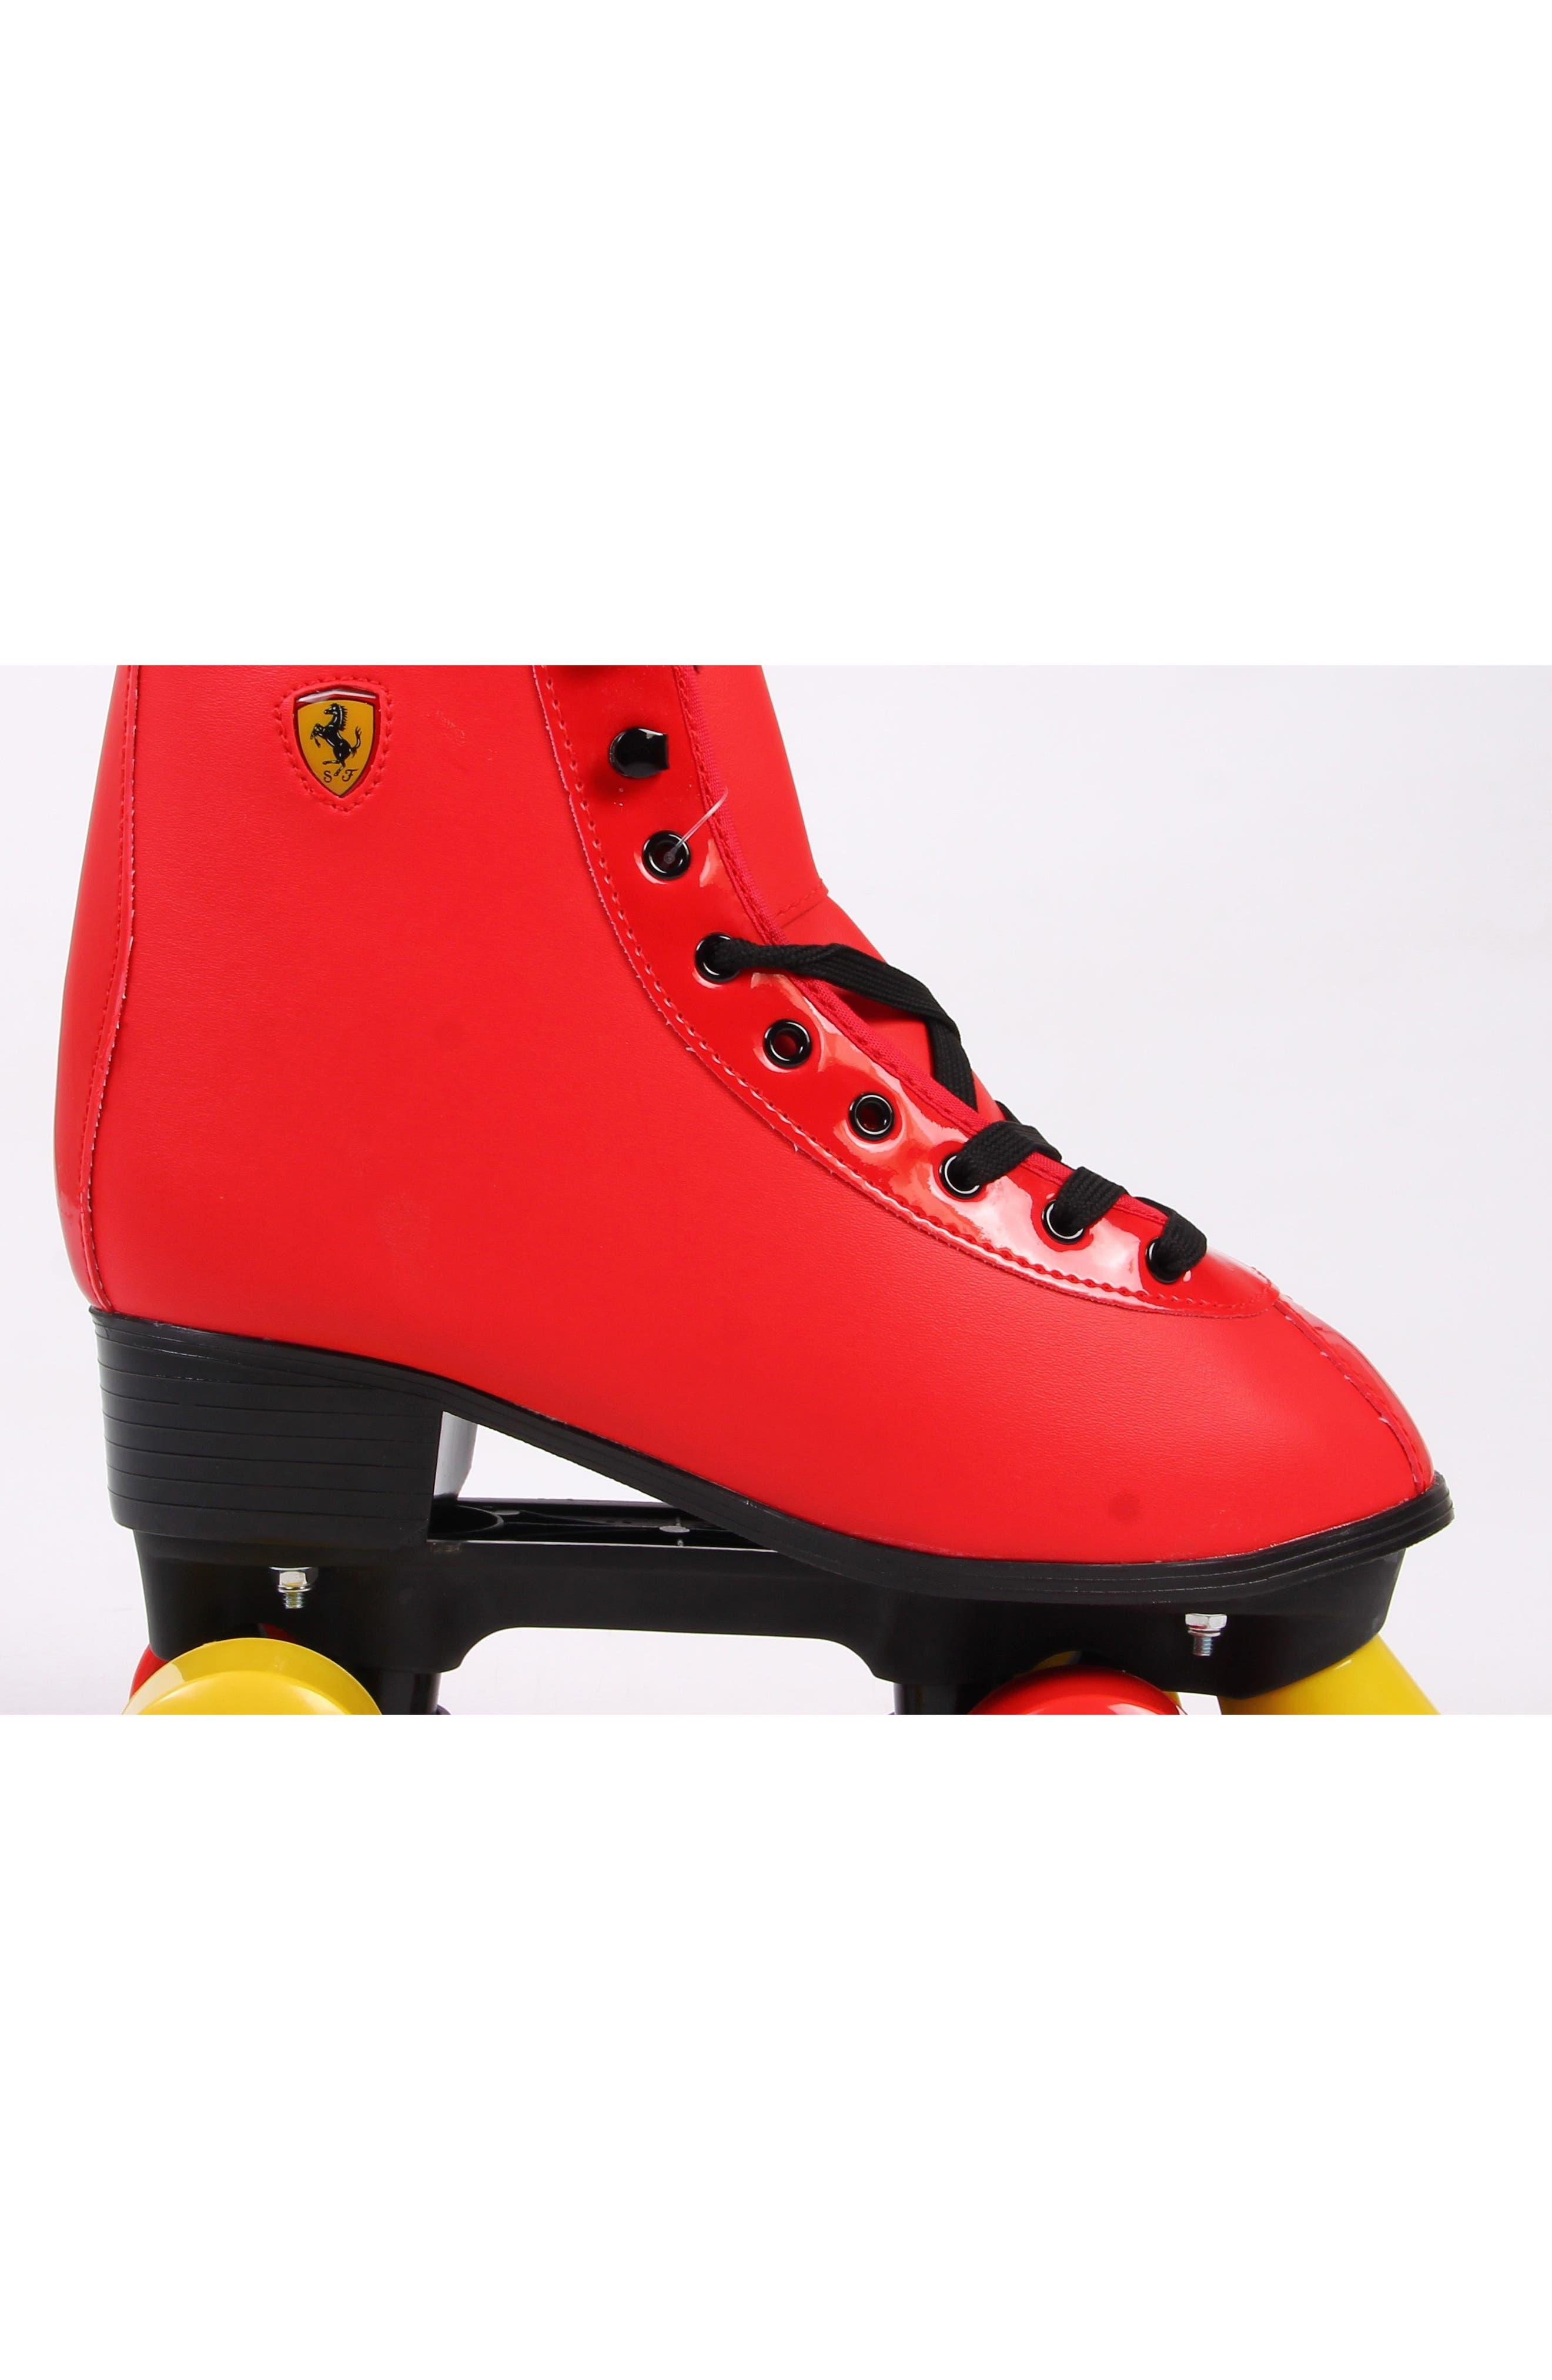 Alternate Image 2  - Ferrari Classic Roller Skates